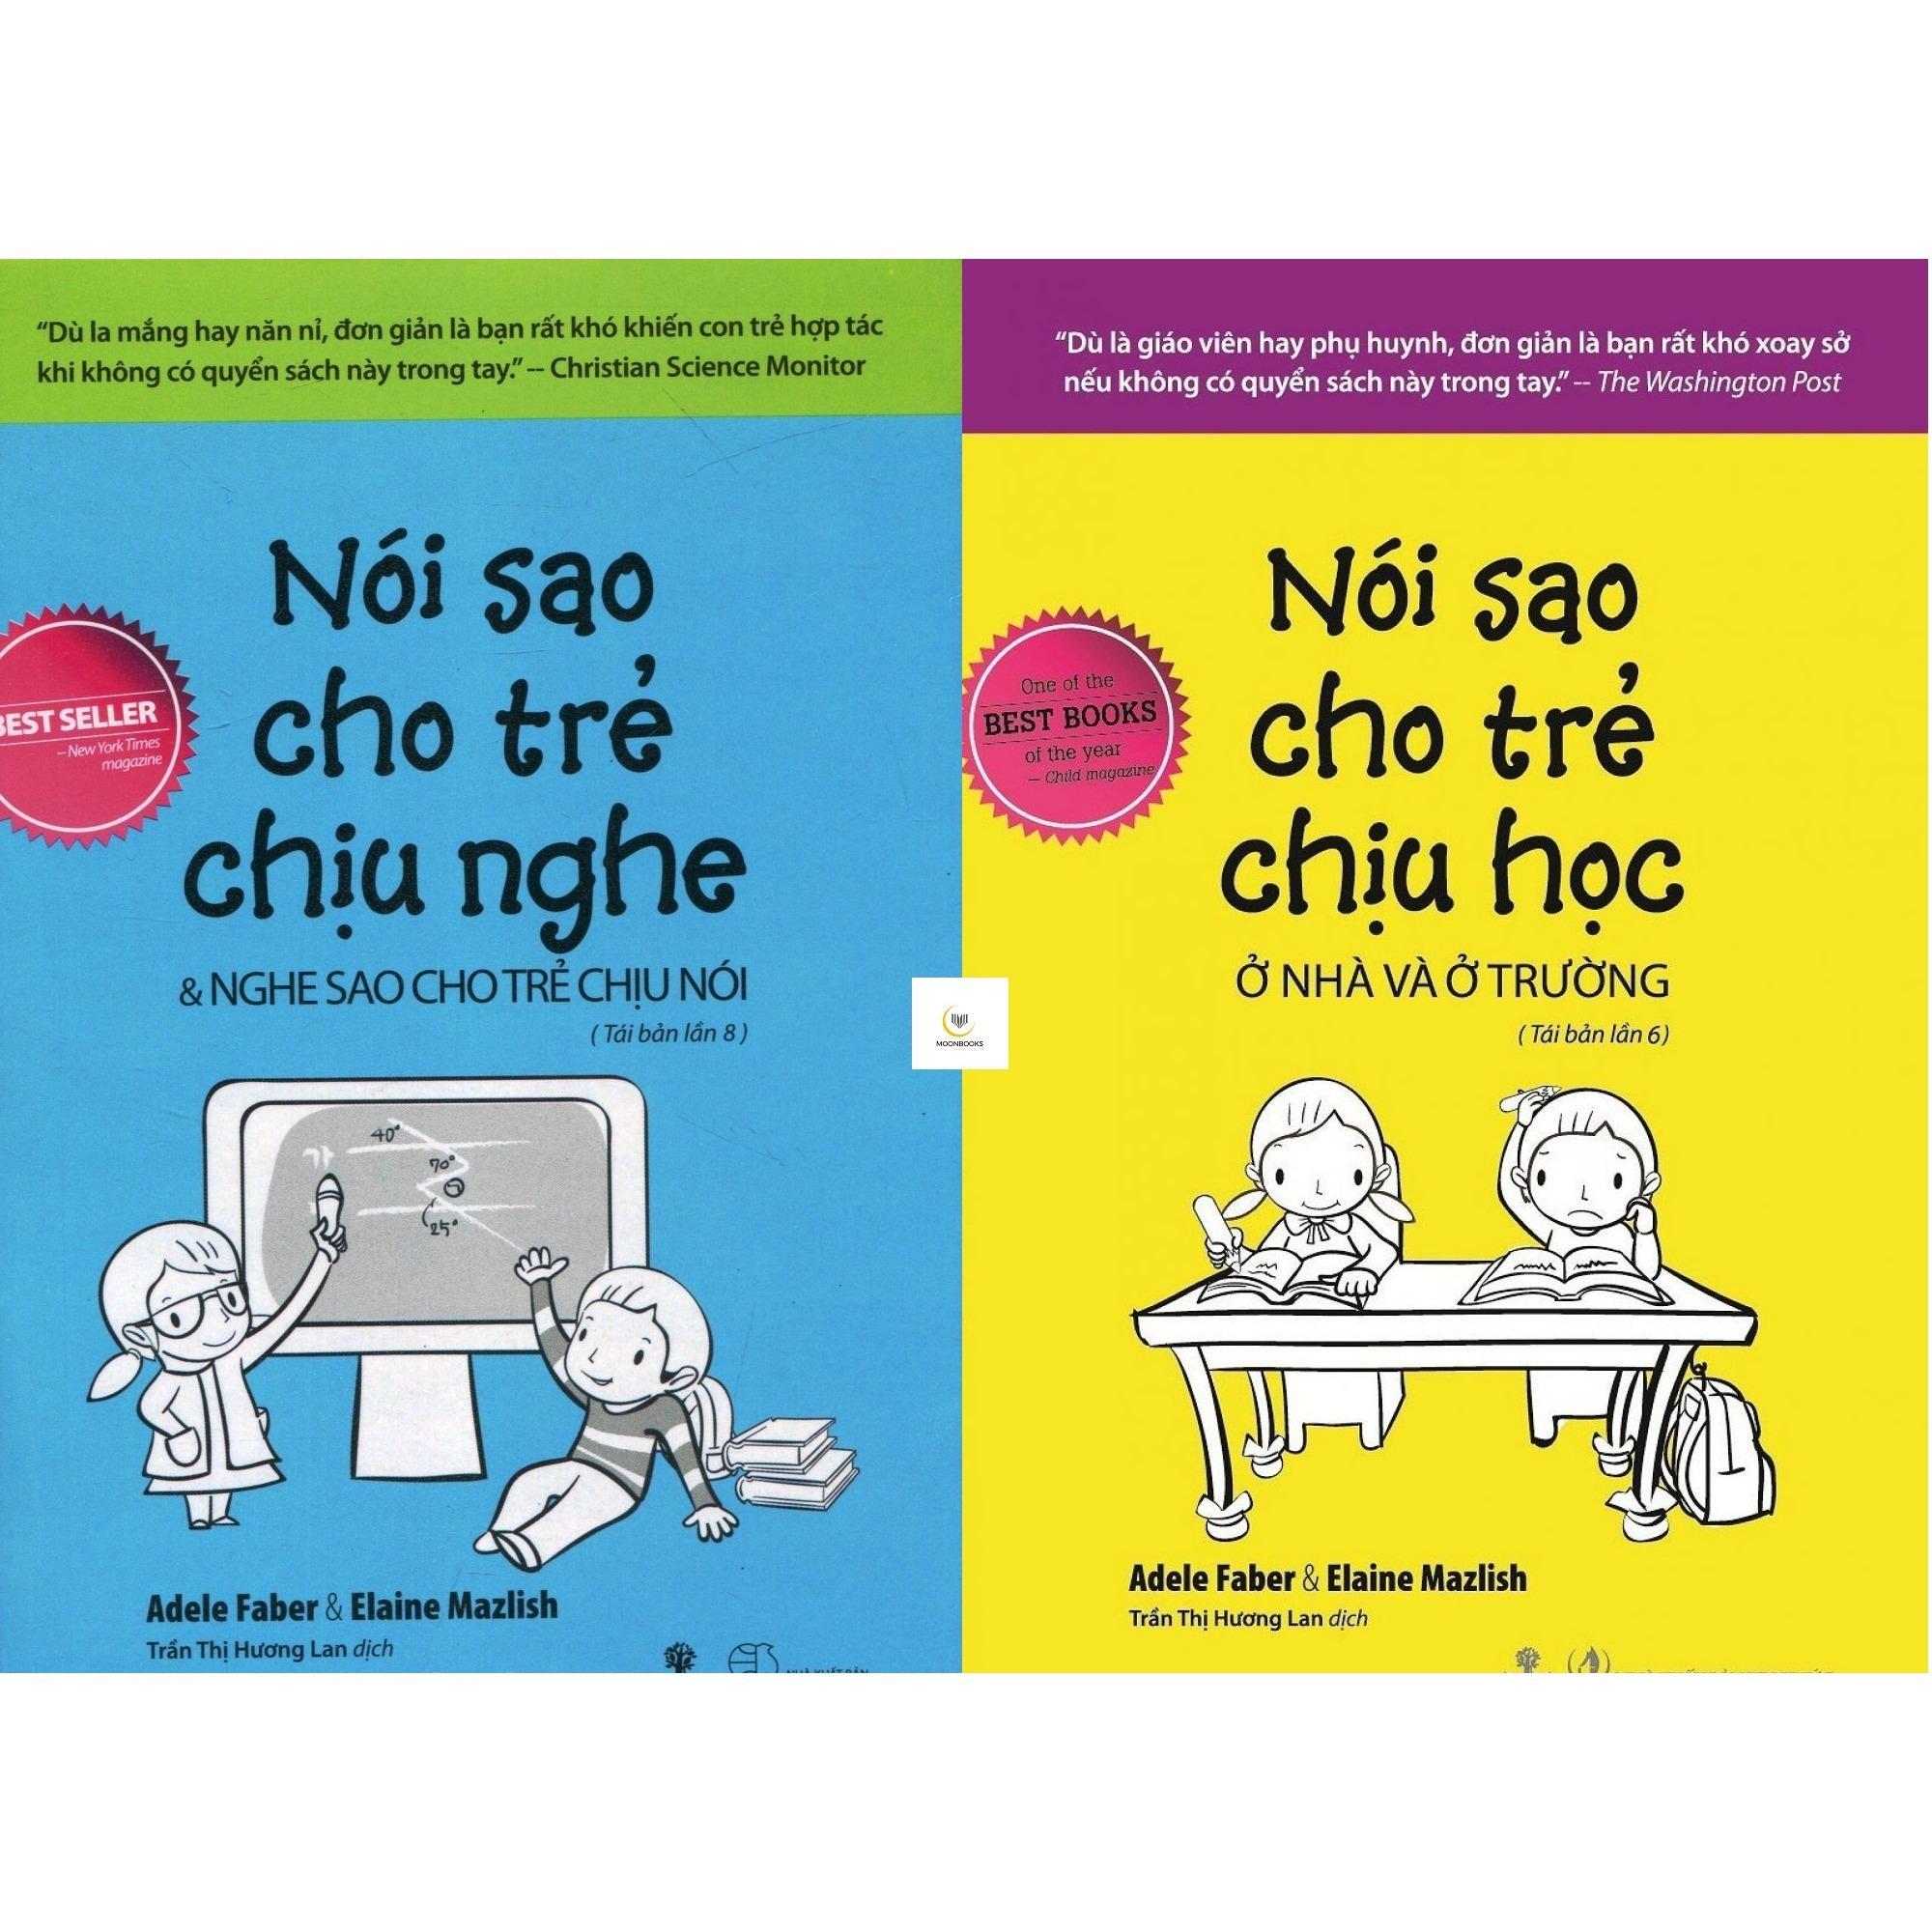 Moonbooks Combo Sach Noi Sao Cho Trẻ Chịu Nghe Noi Sao Cho Trẻ Chịu Học Elaine Mazlish Adele Faber Hà Nội